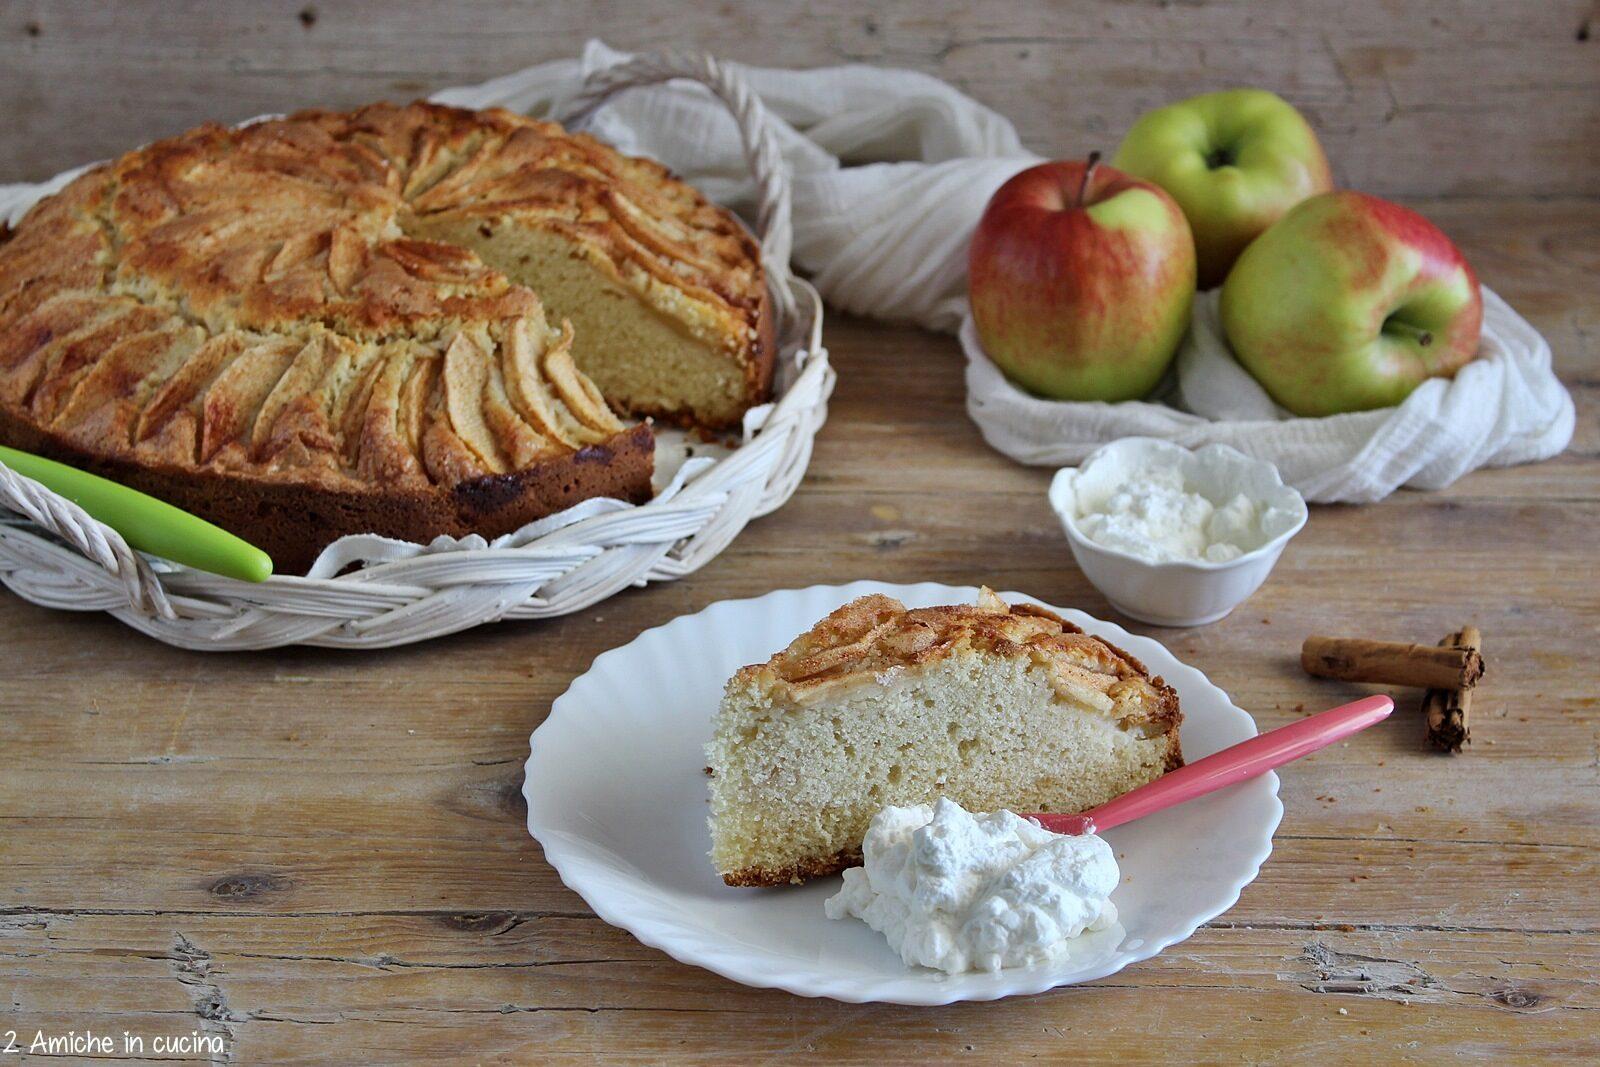 Torta di mele islandese con panna montata